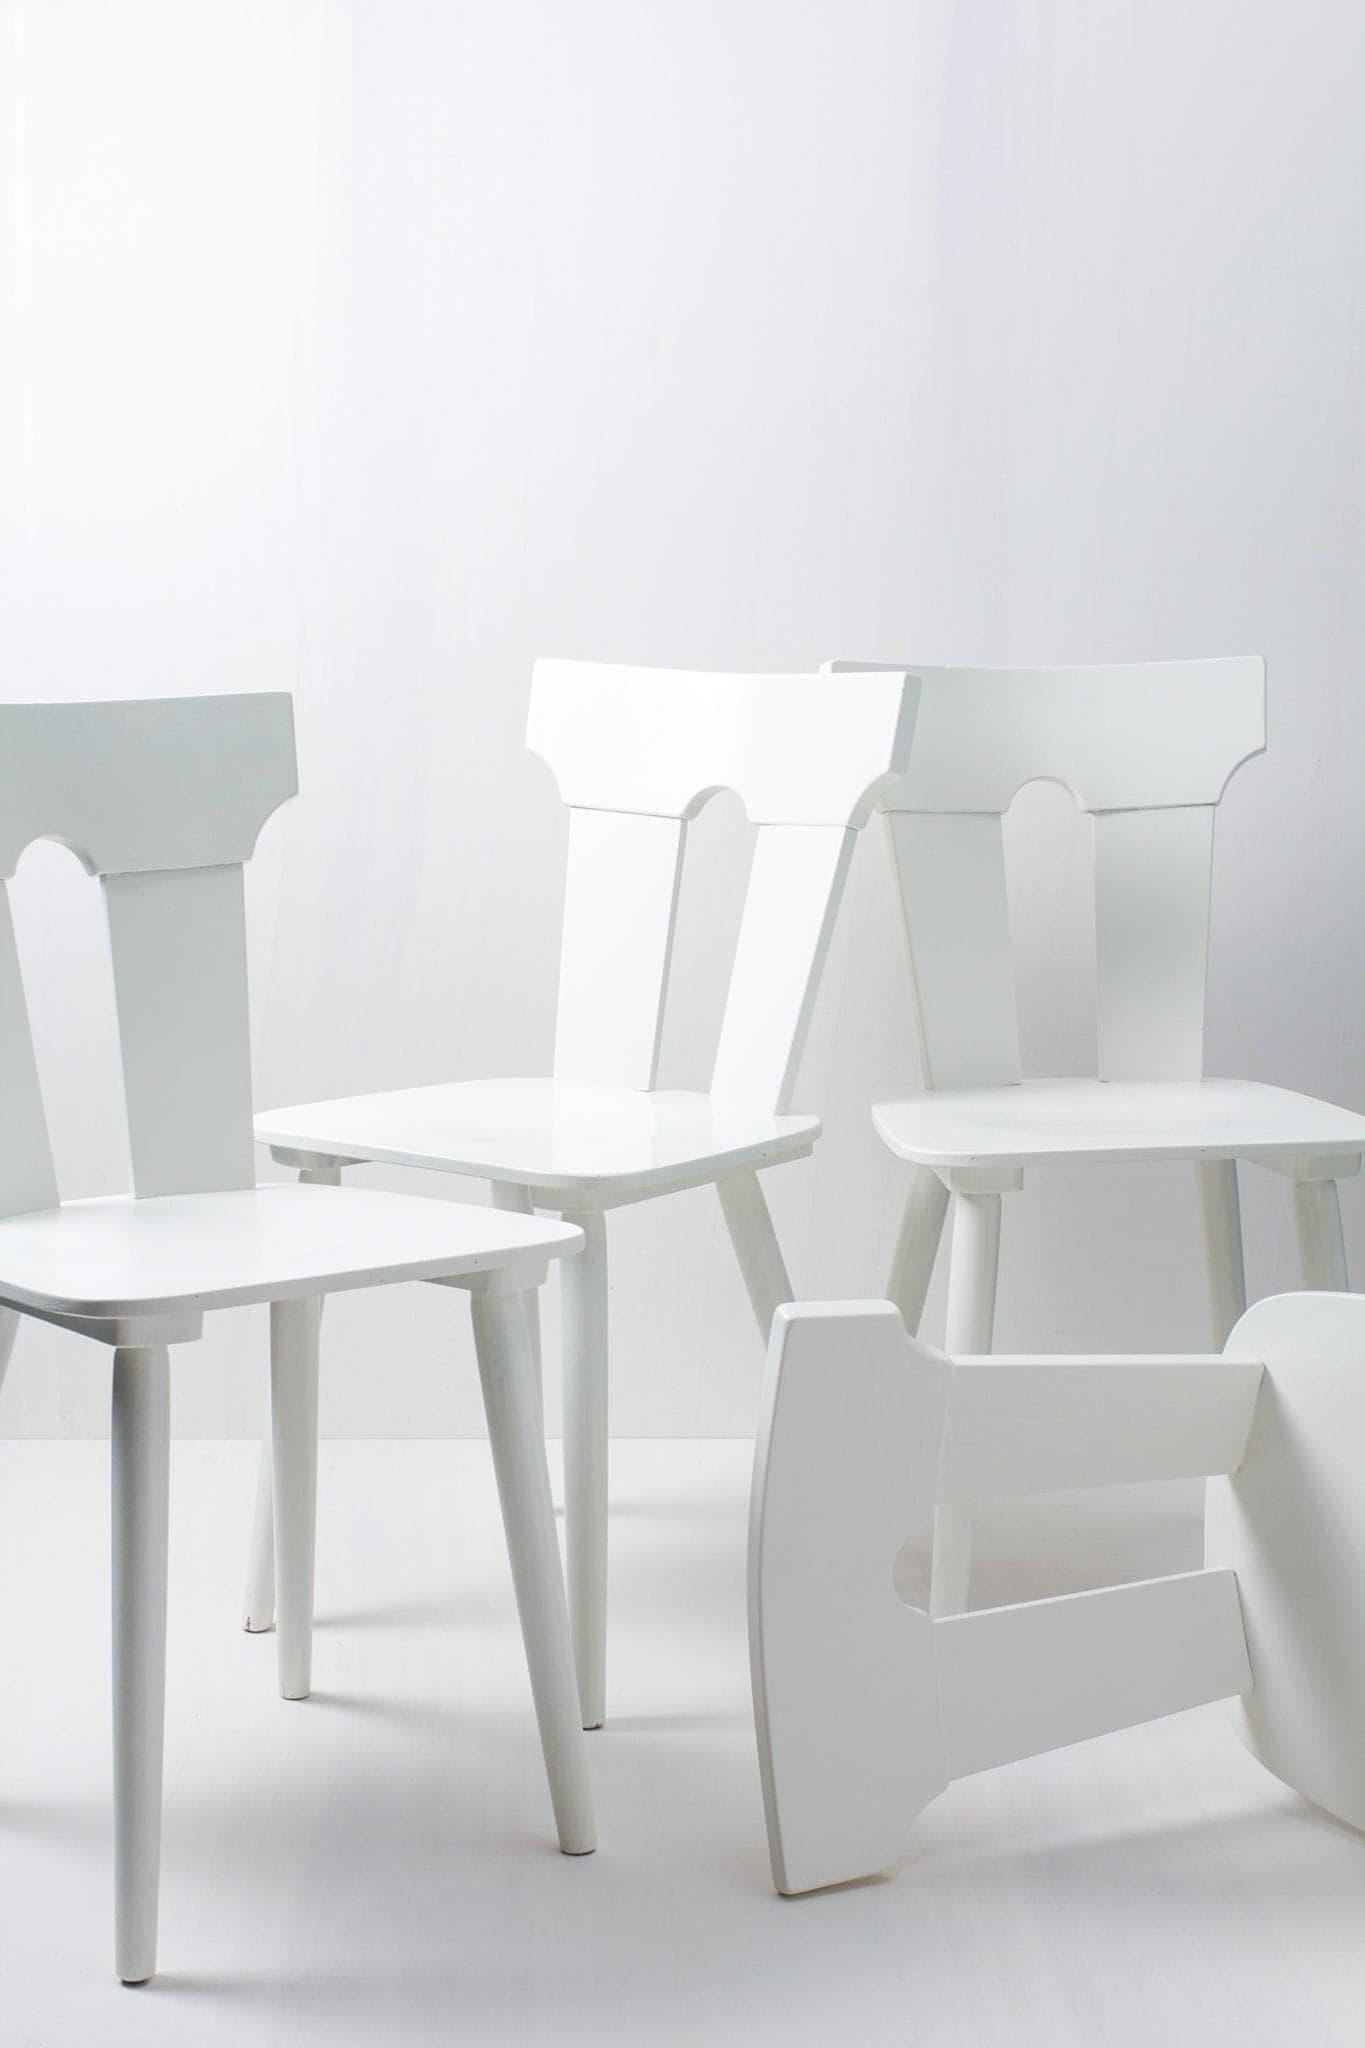 Rustikale, weiße Holzstühle mieten, rustikale Mietmöbel